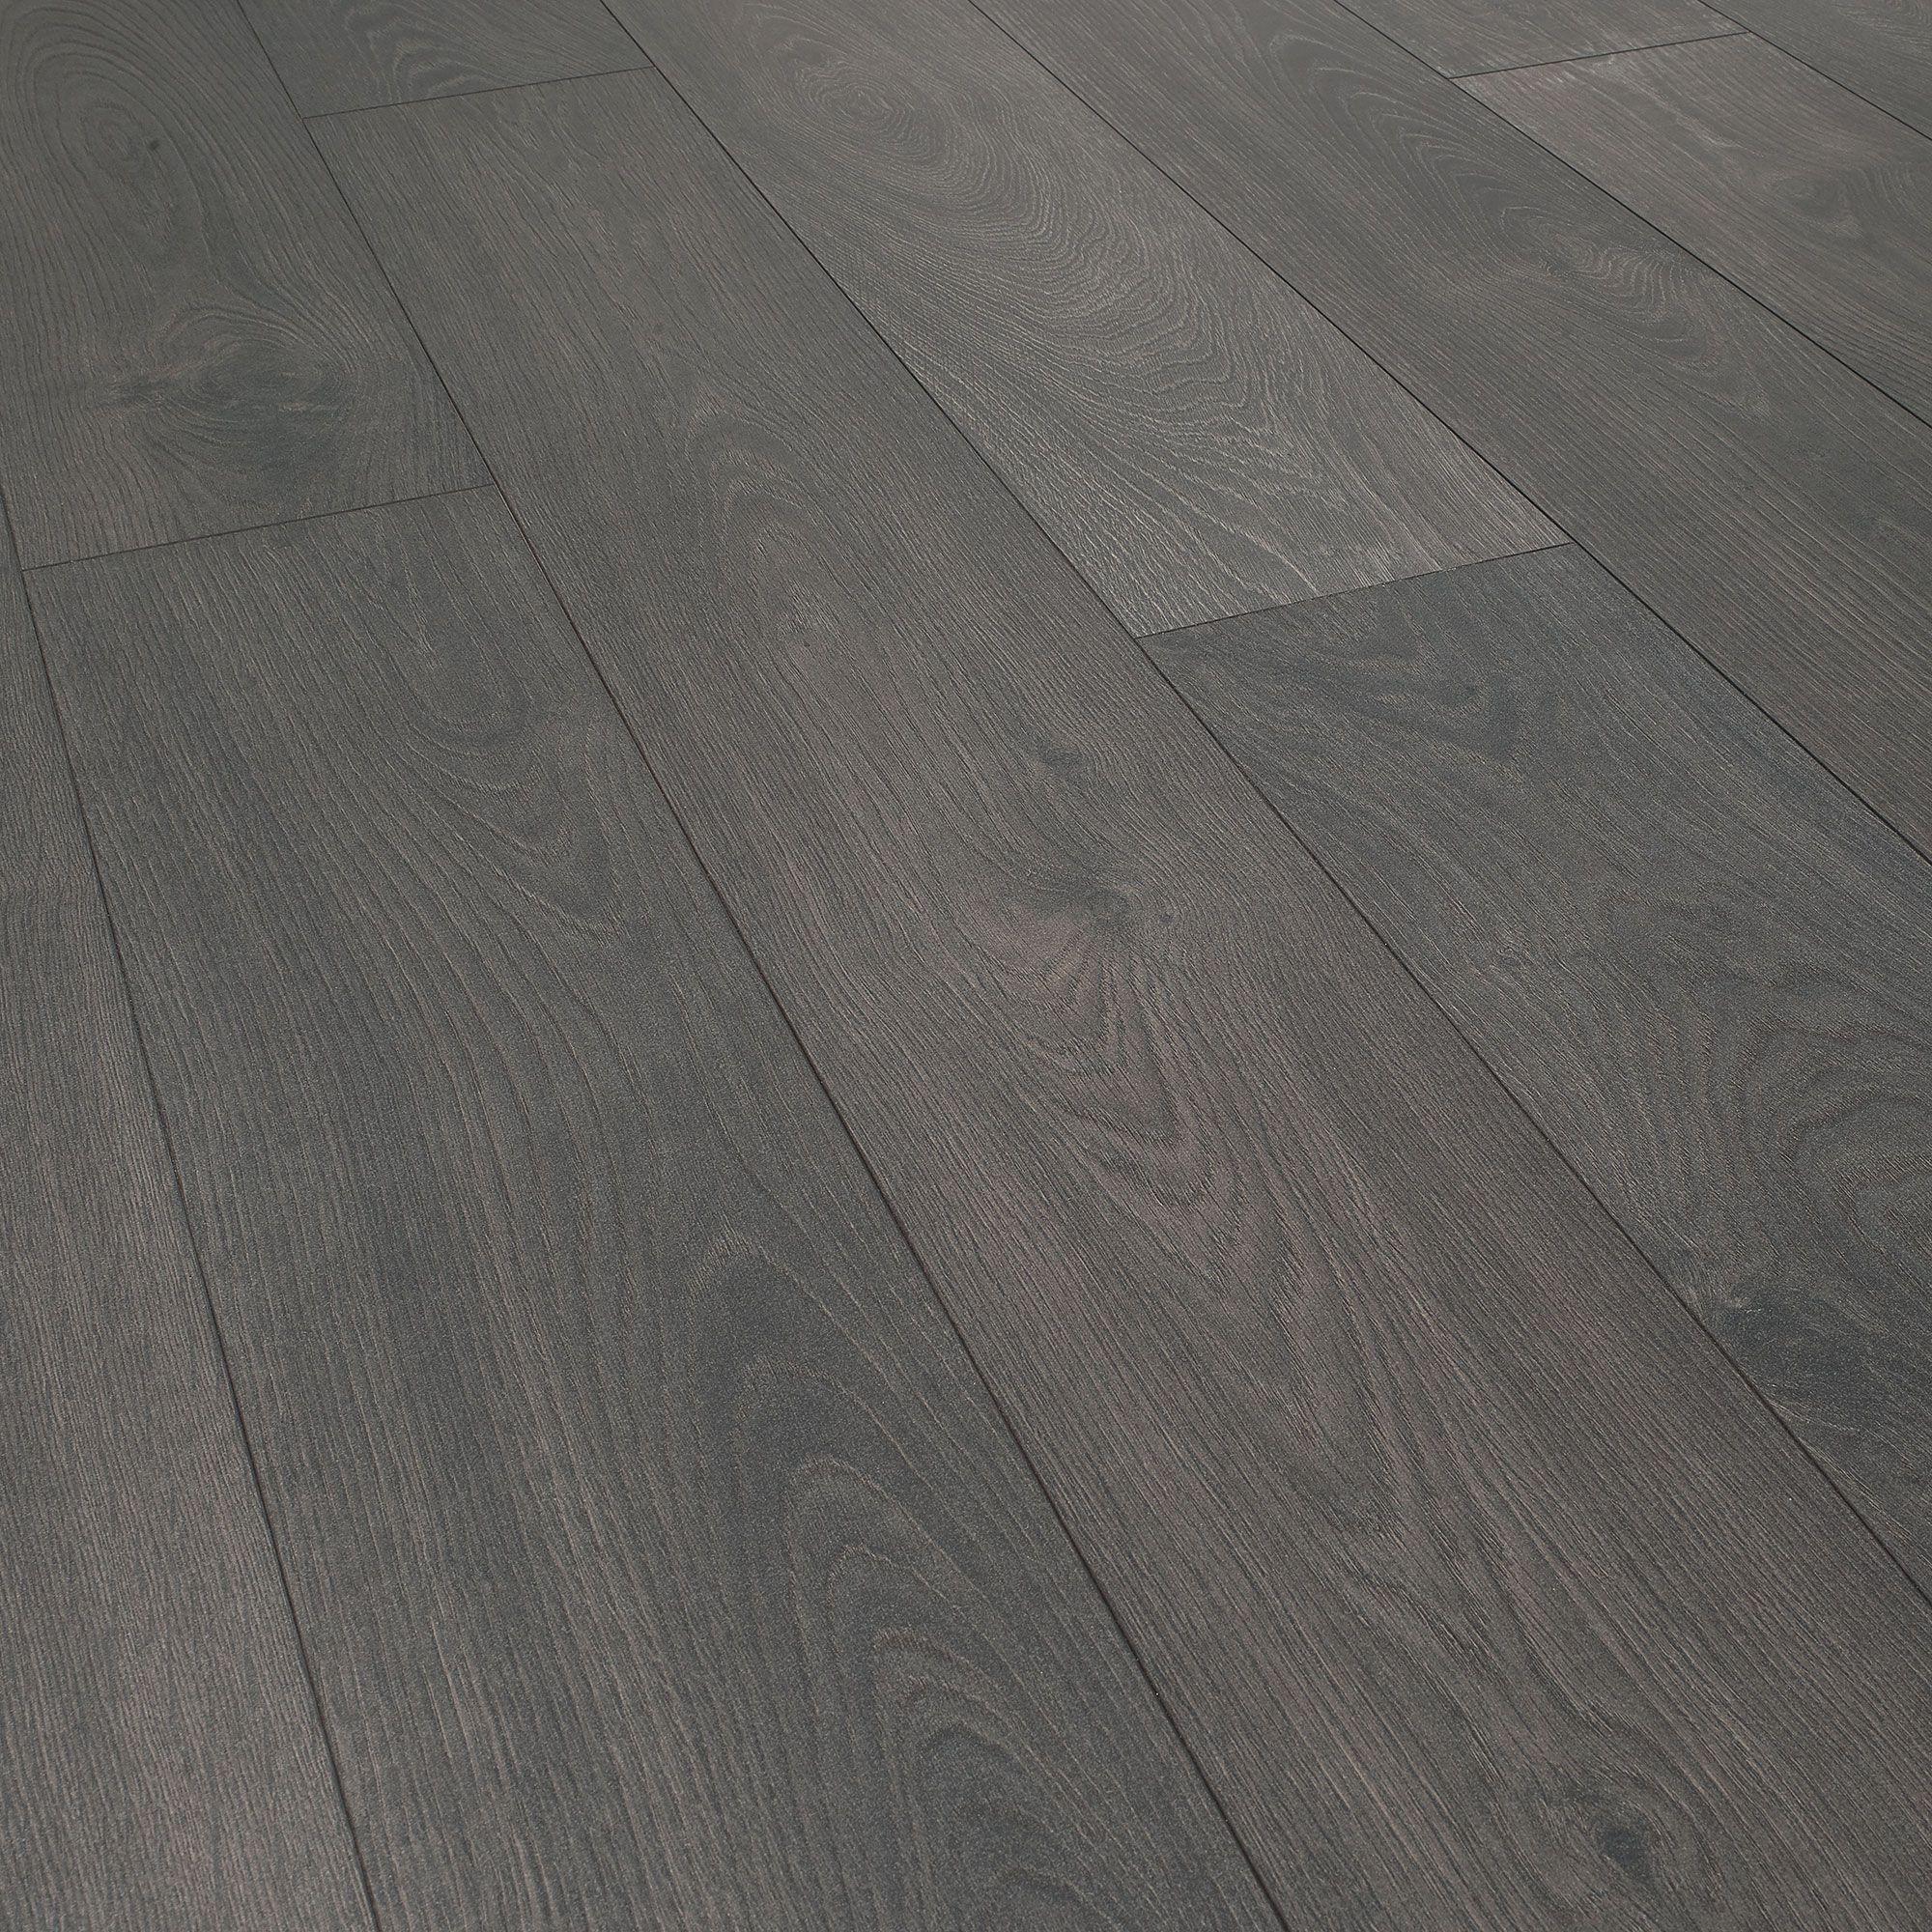 Kronoswiss Swiss Authentic Zermatt Oak 8mm Textured Laminate Flooring